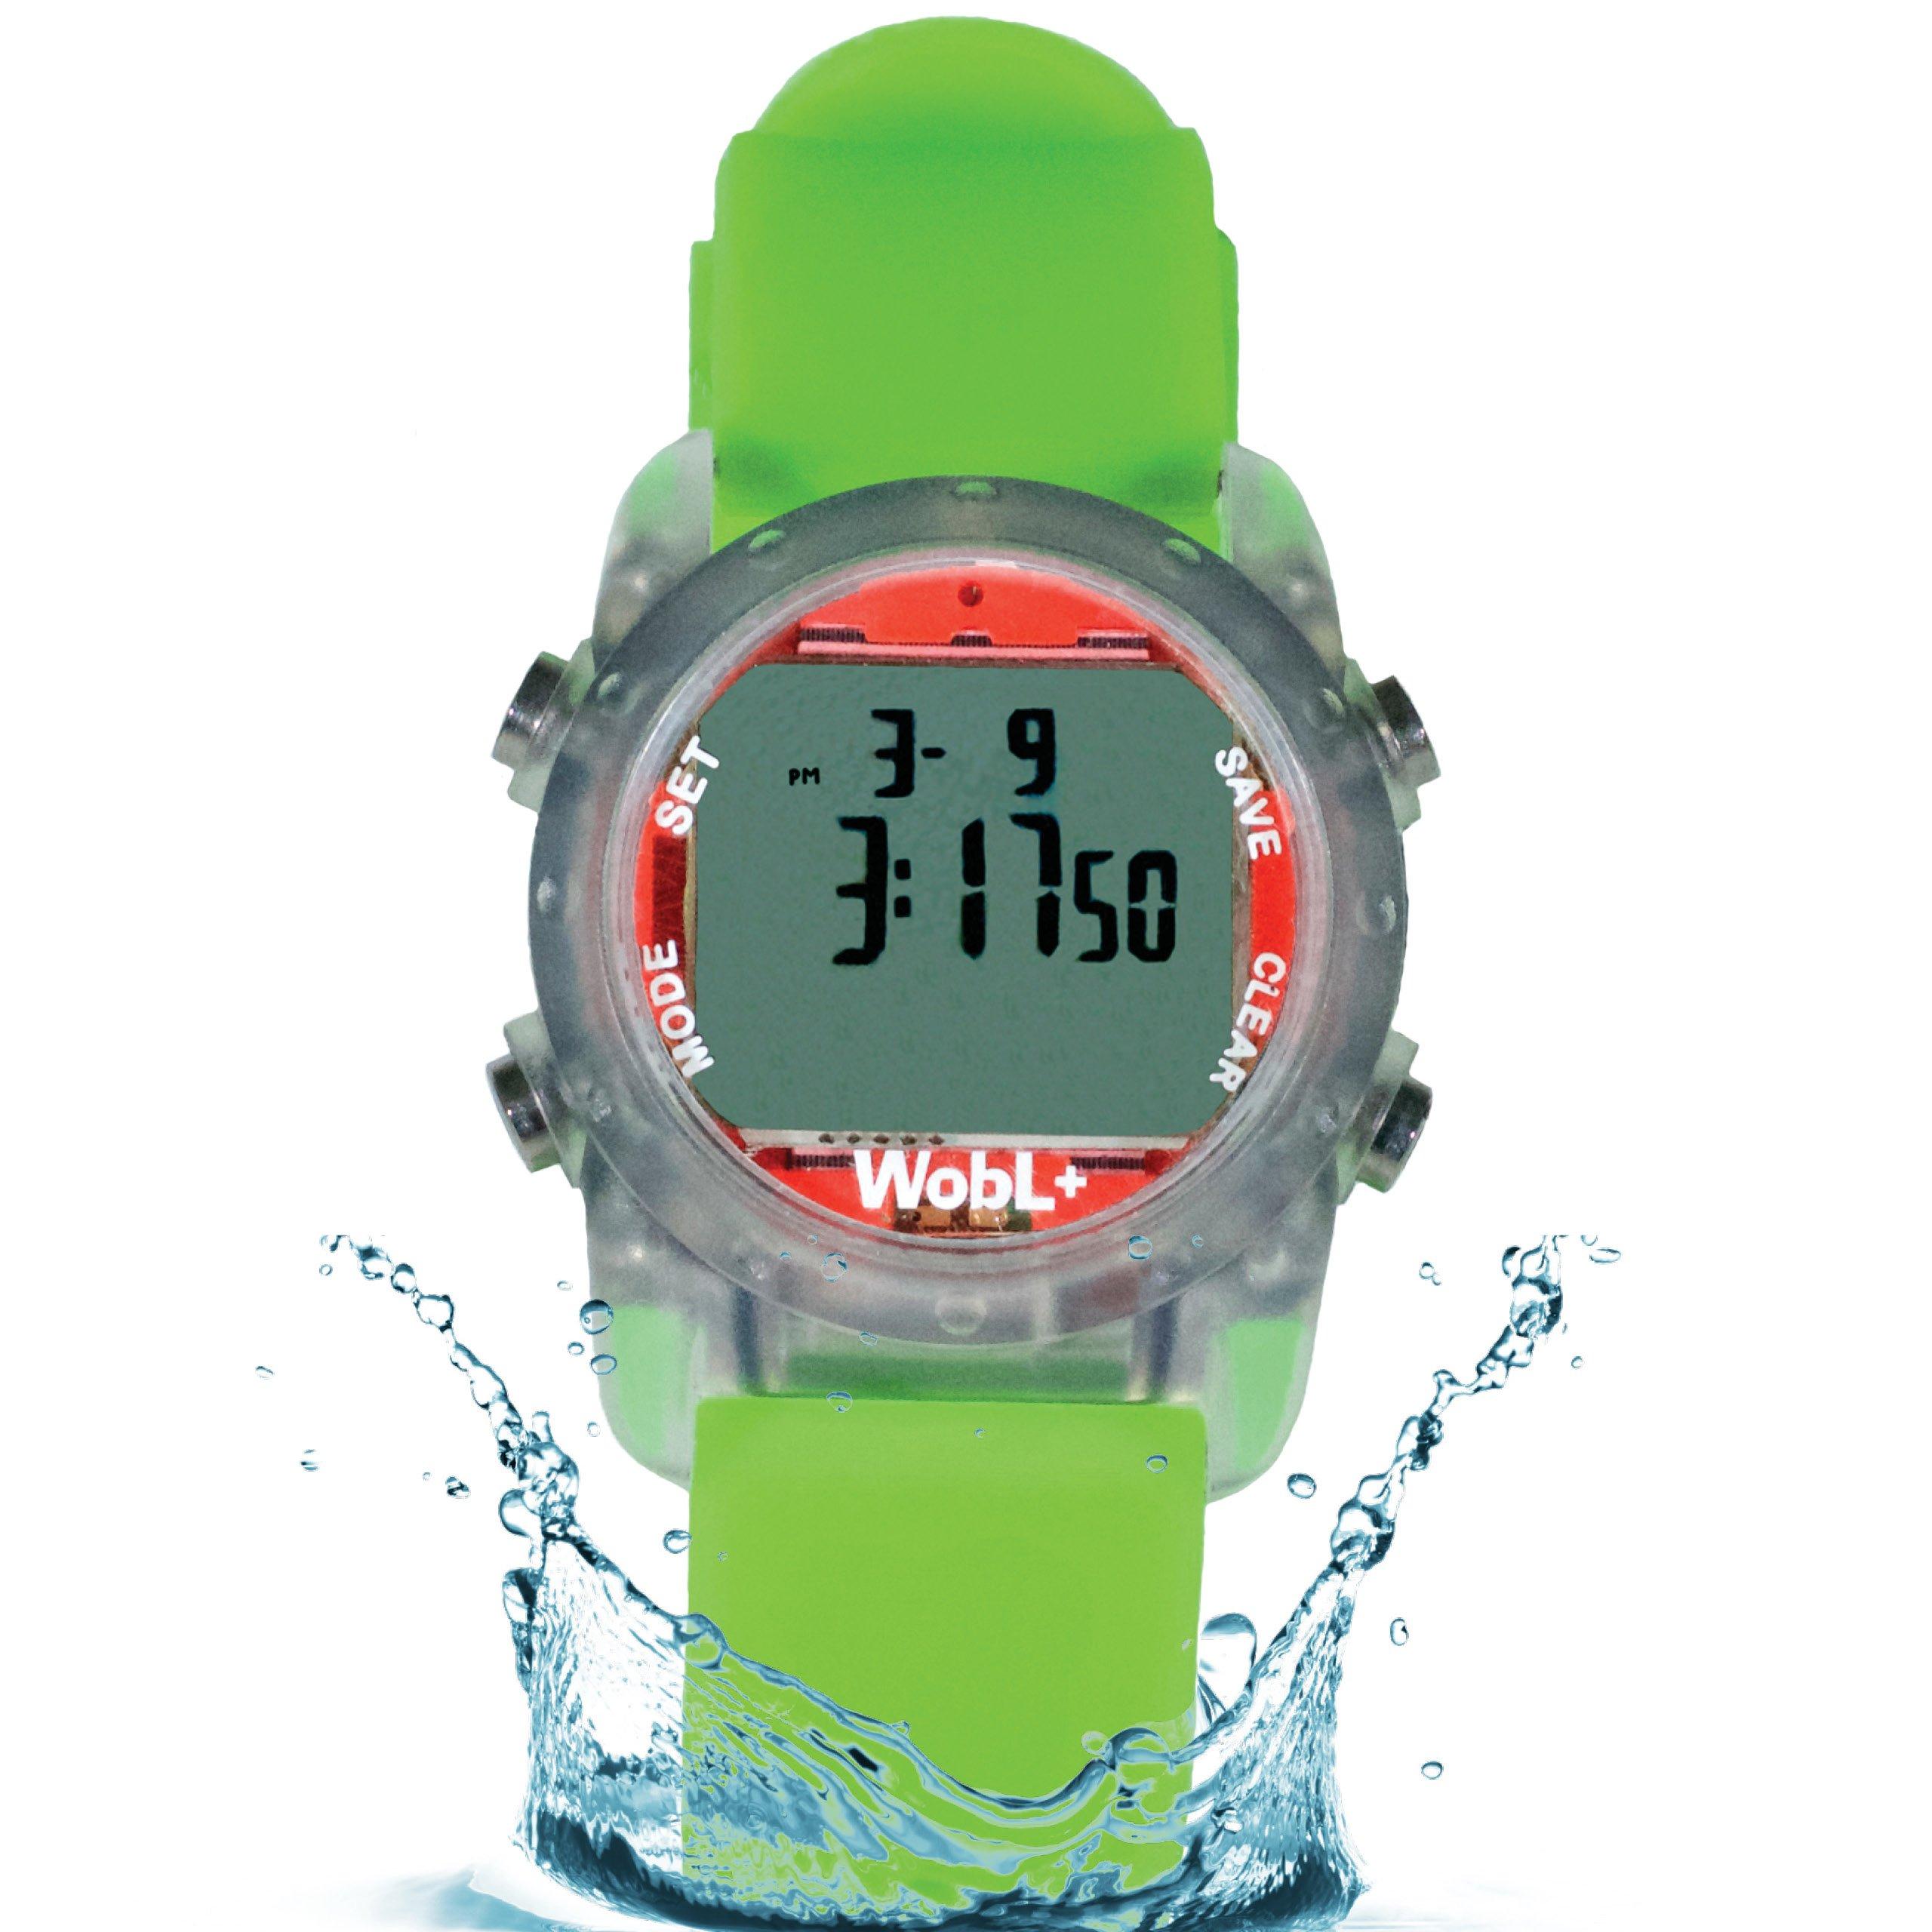 WobL+ Waterproof Vibrating Watch (Green), 9 Alarms